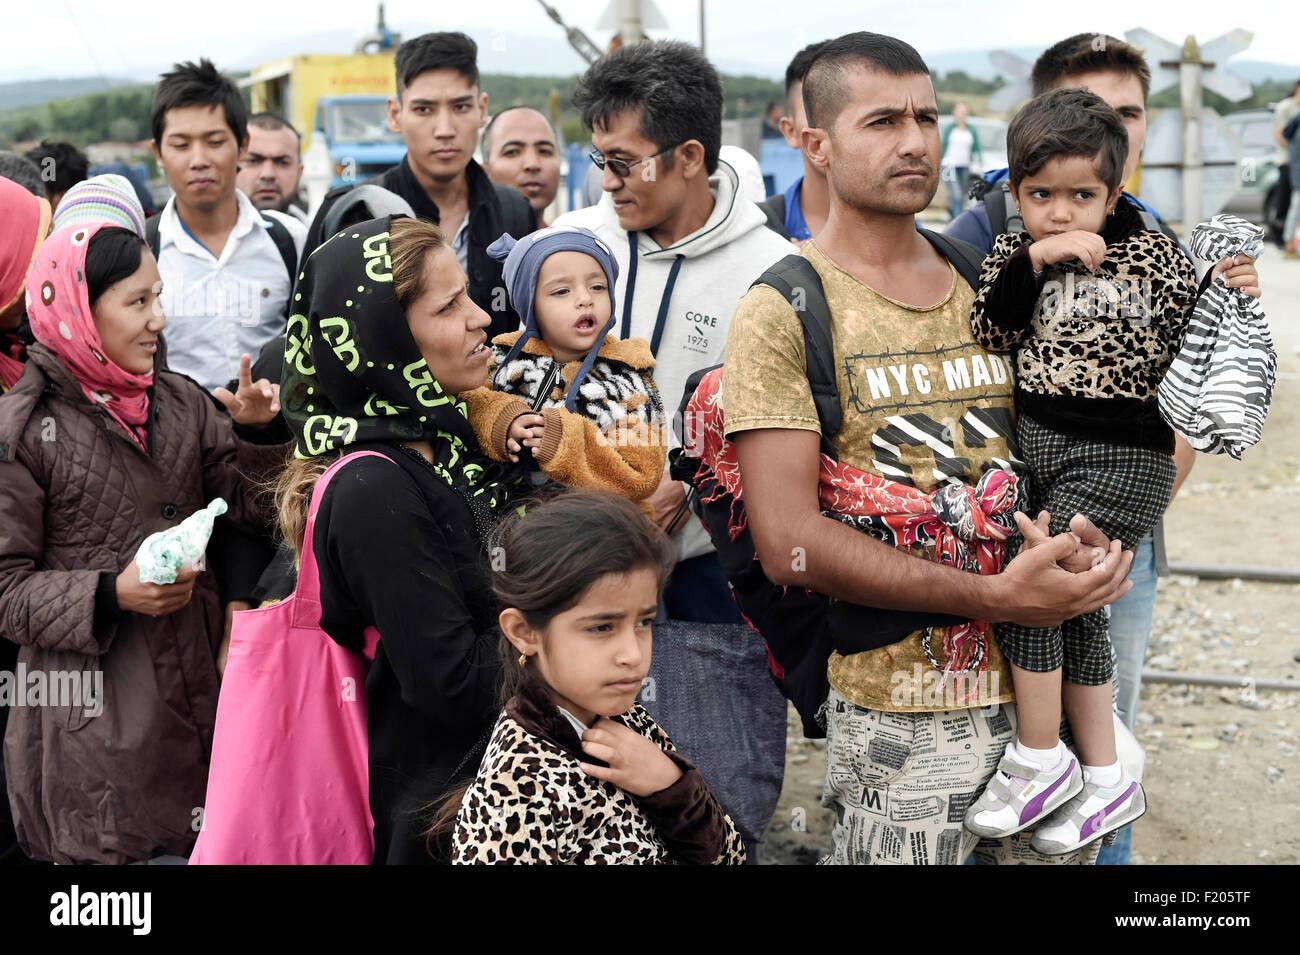 Greece/Macedonia border Idomeni/Gevgelija  September, 08 2015 - thousands of migrants were pouring over the frontier - Stock Image